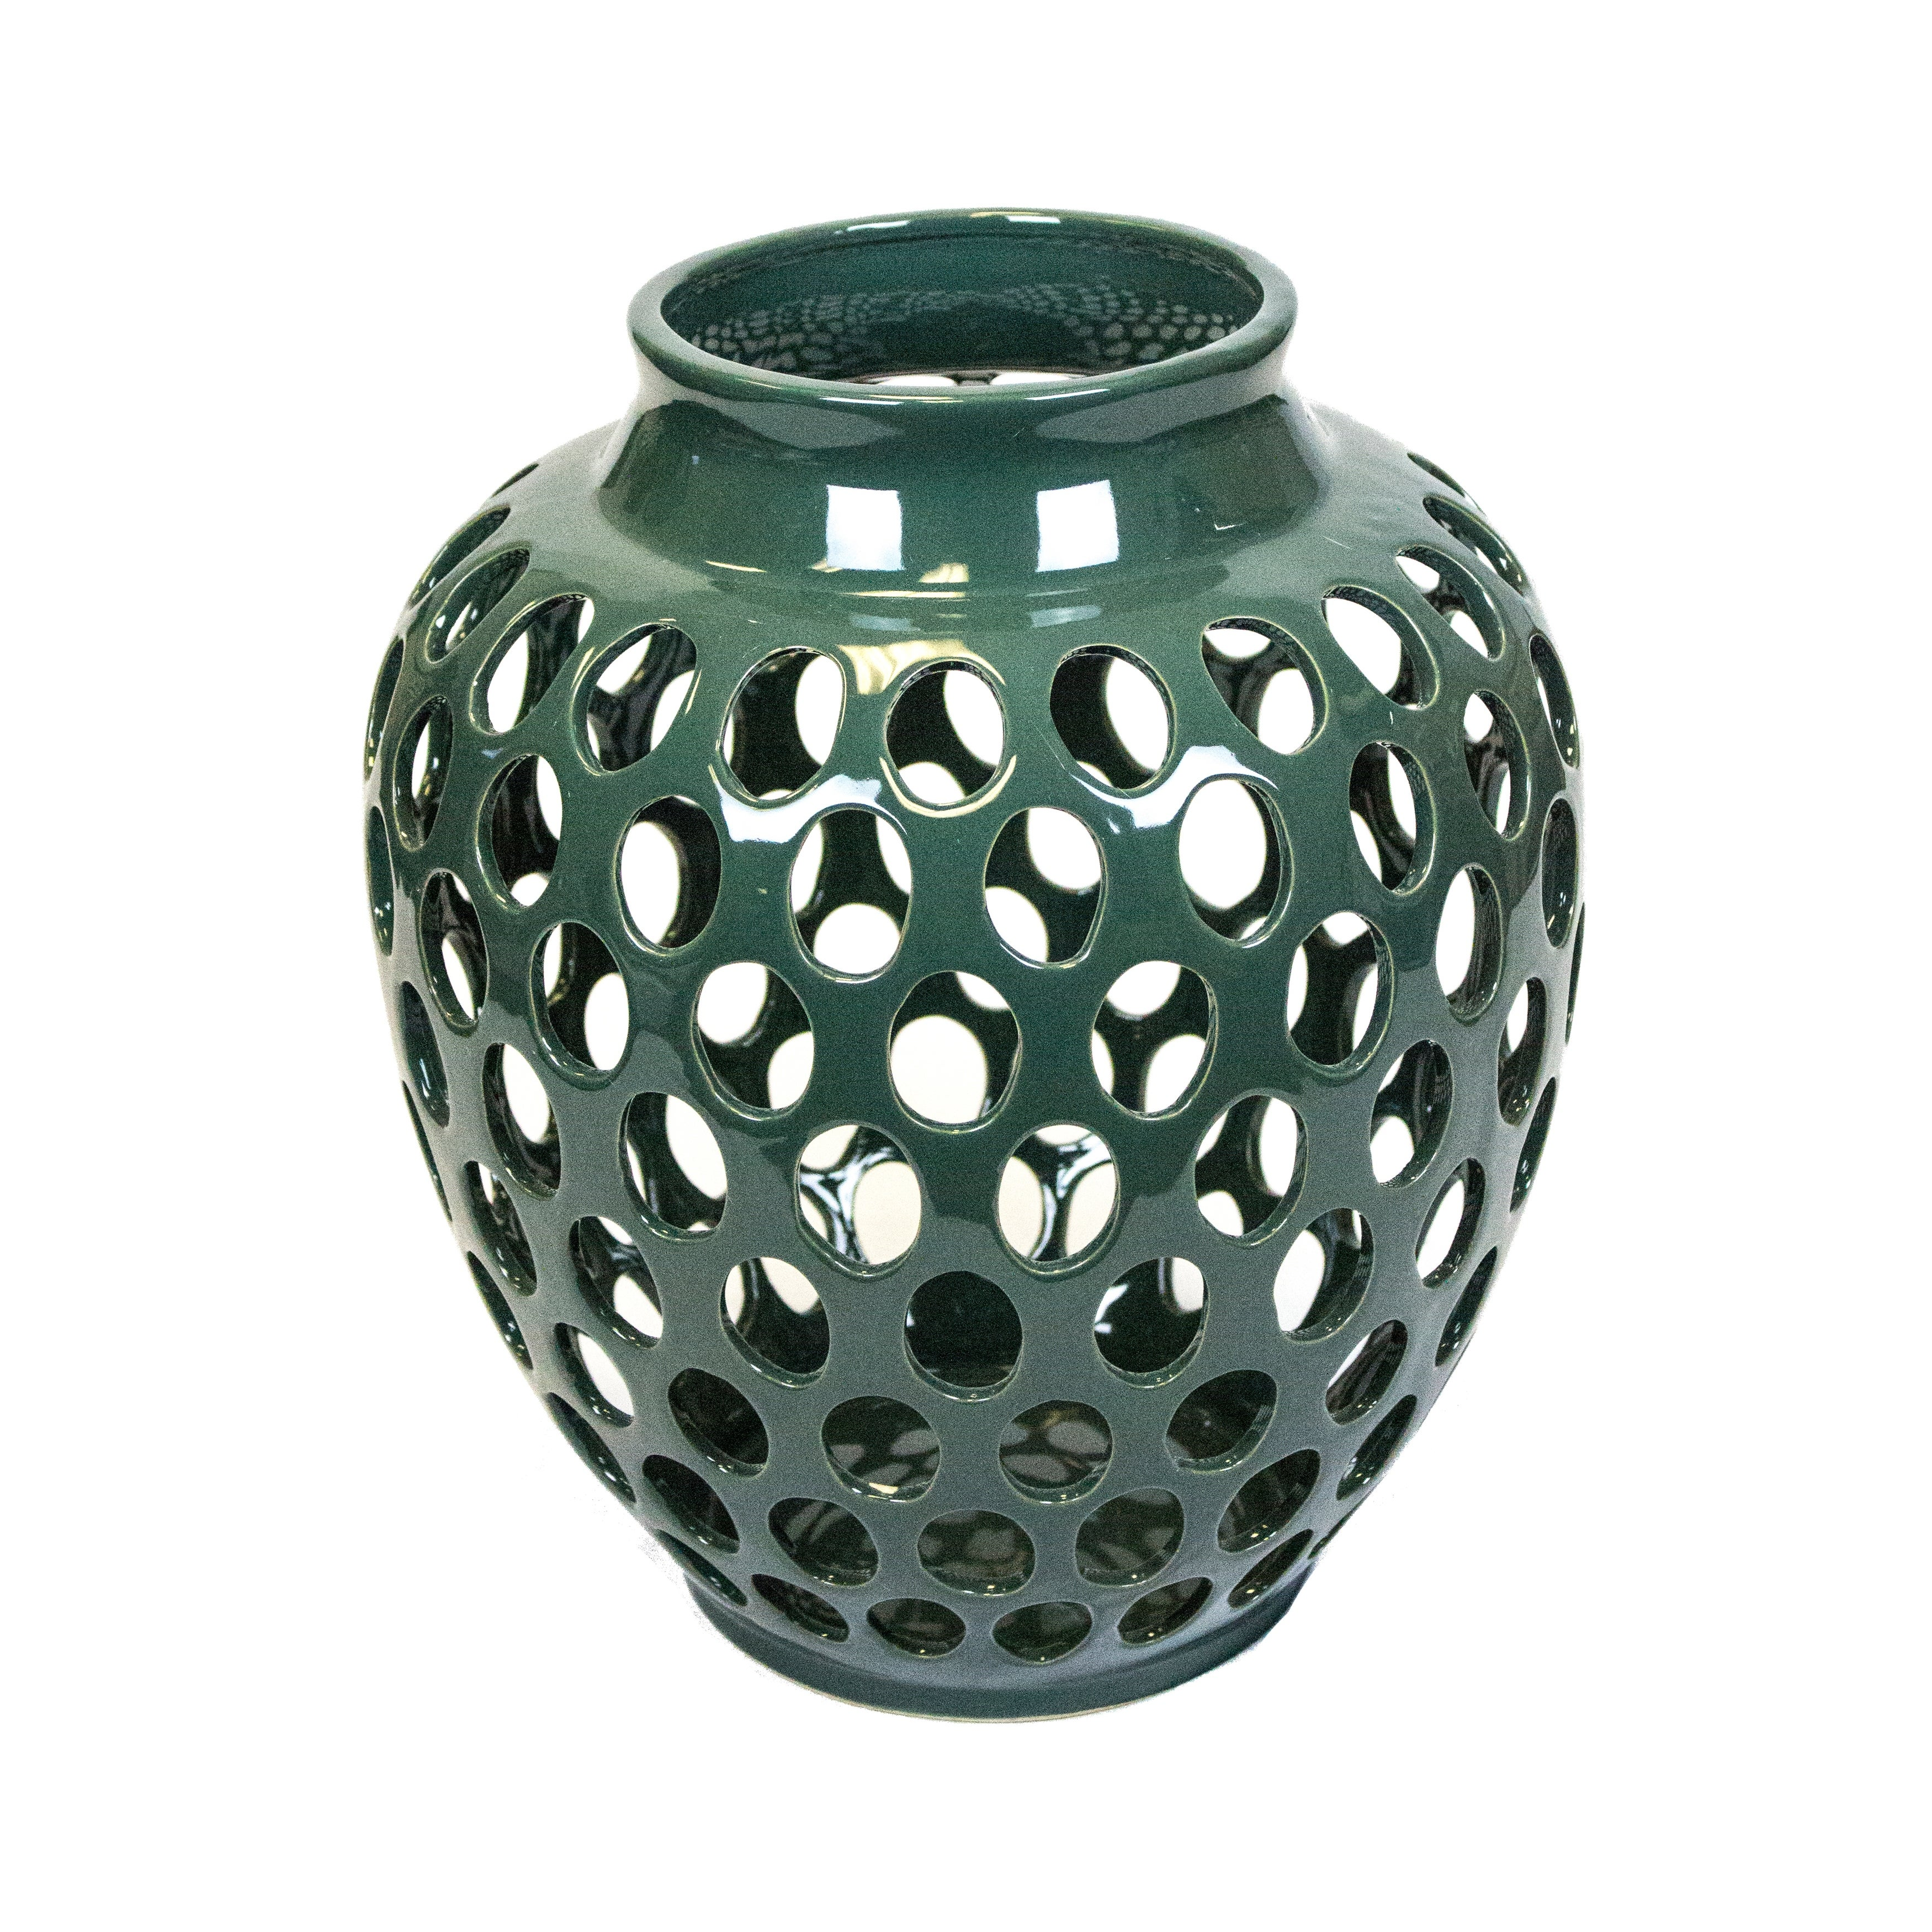 Decorative Urn Shape Ceramic Vase with Round Cutout Details, Green